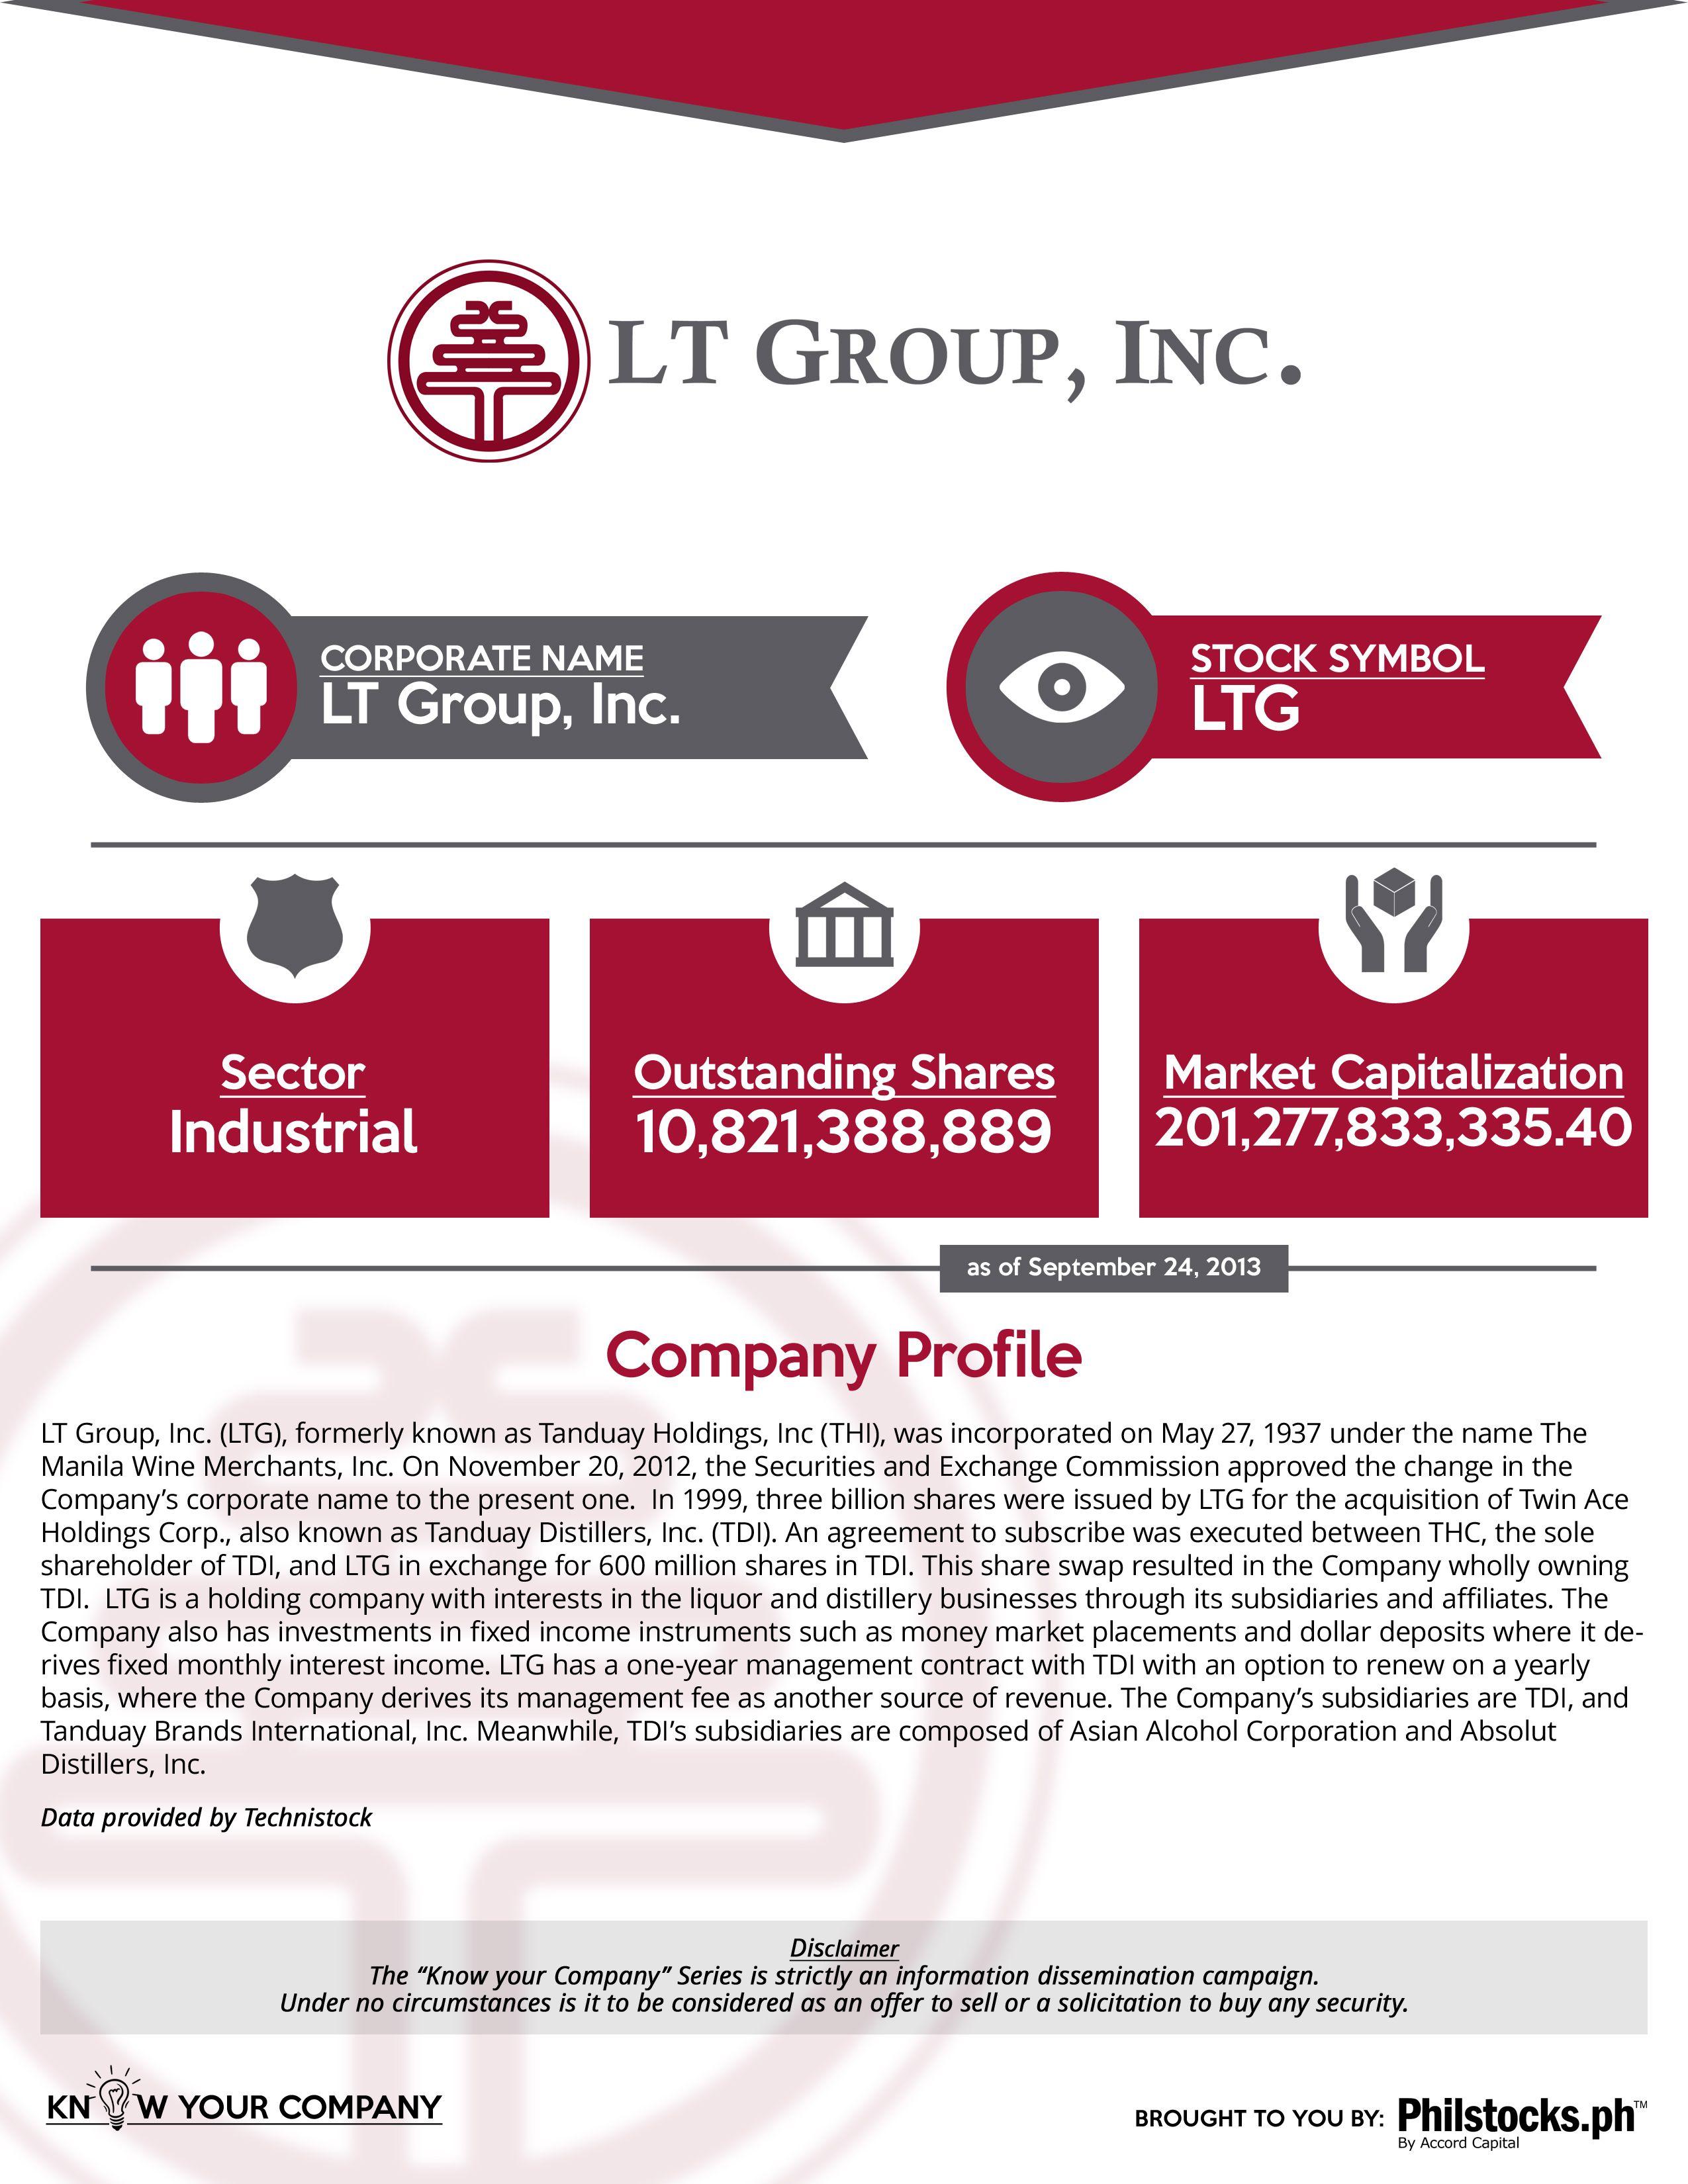 LT Group, Inc. (LTG)